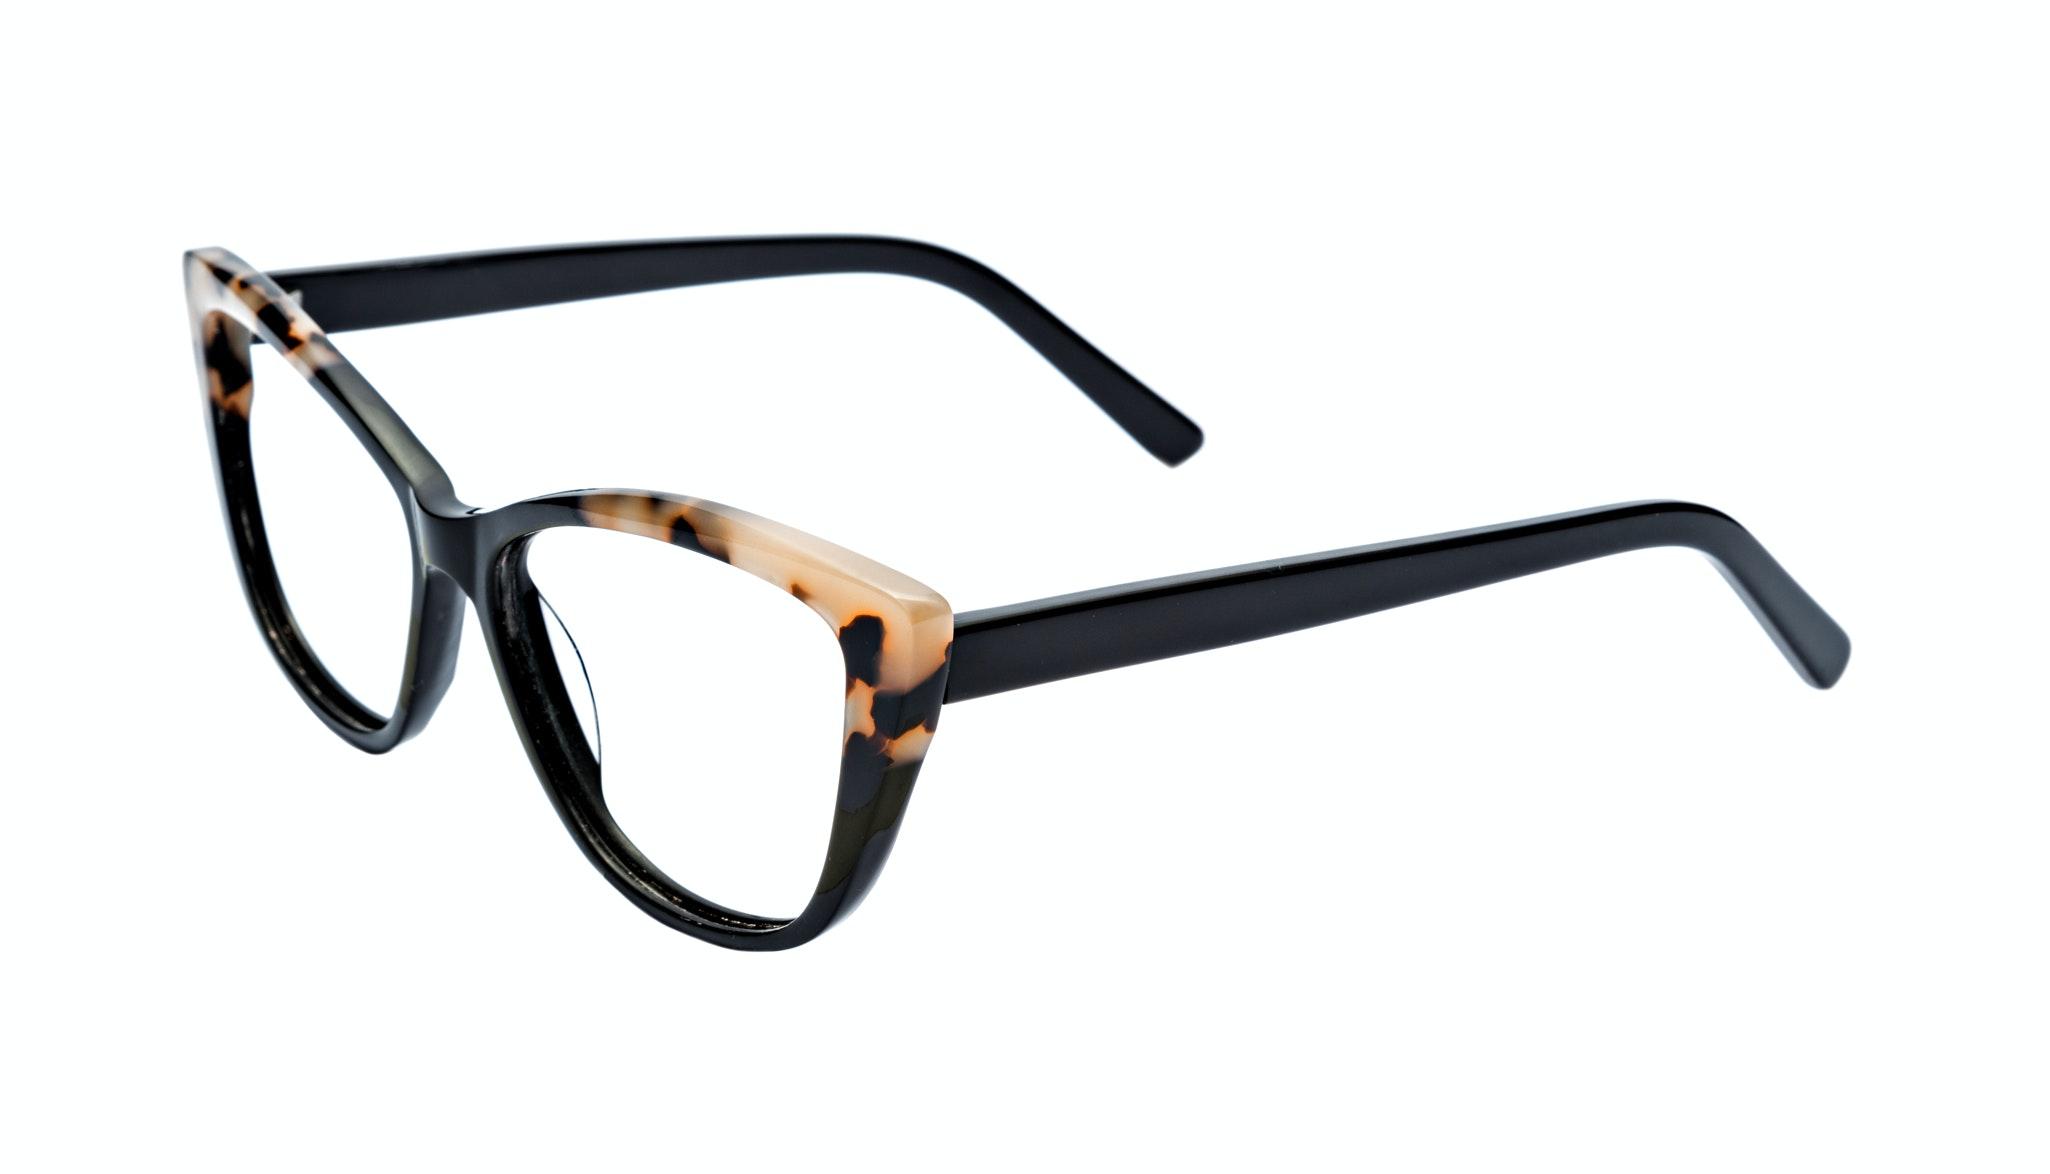 Affordable Fashion Glasses Cat Eye Eyeglasses Women Dolled Up Ebony Granite Tilt